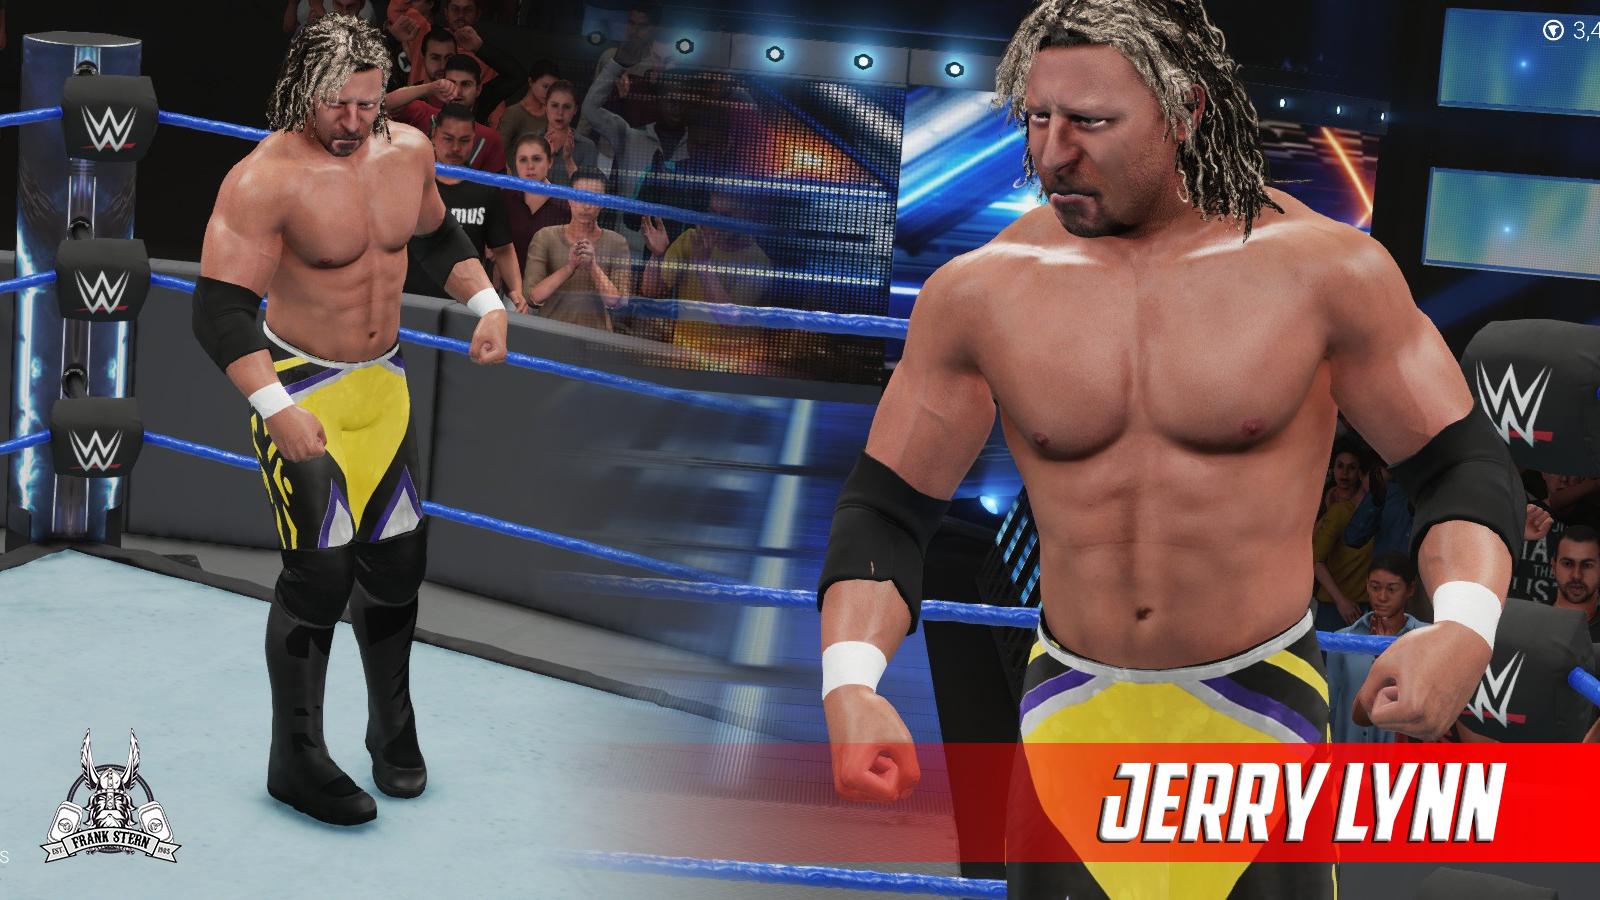 Preview-JERRY-LYNN.jpg